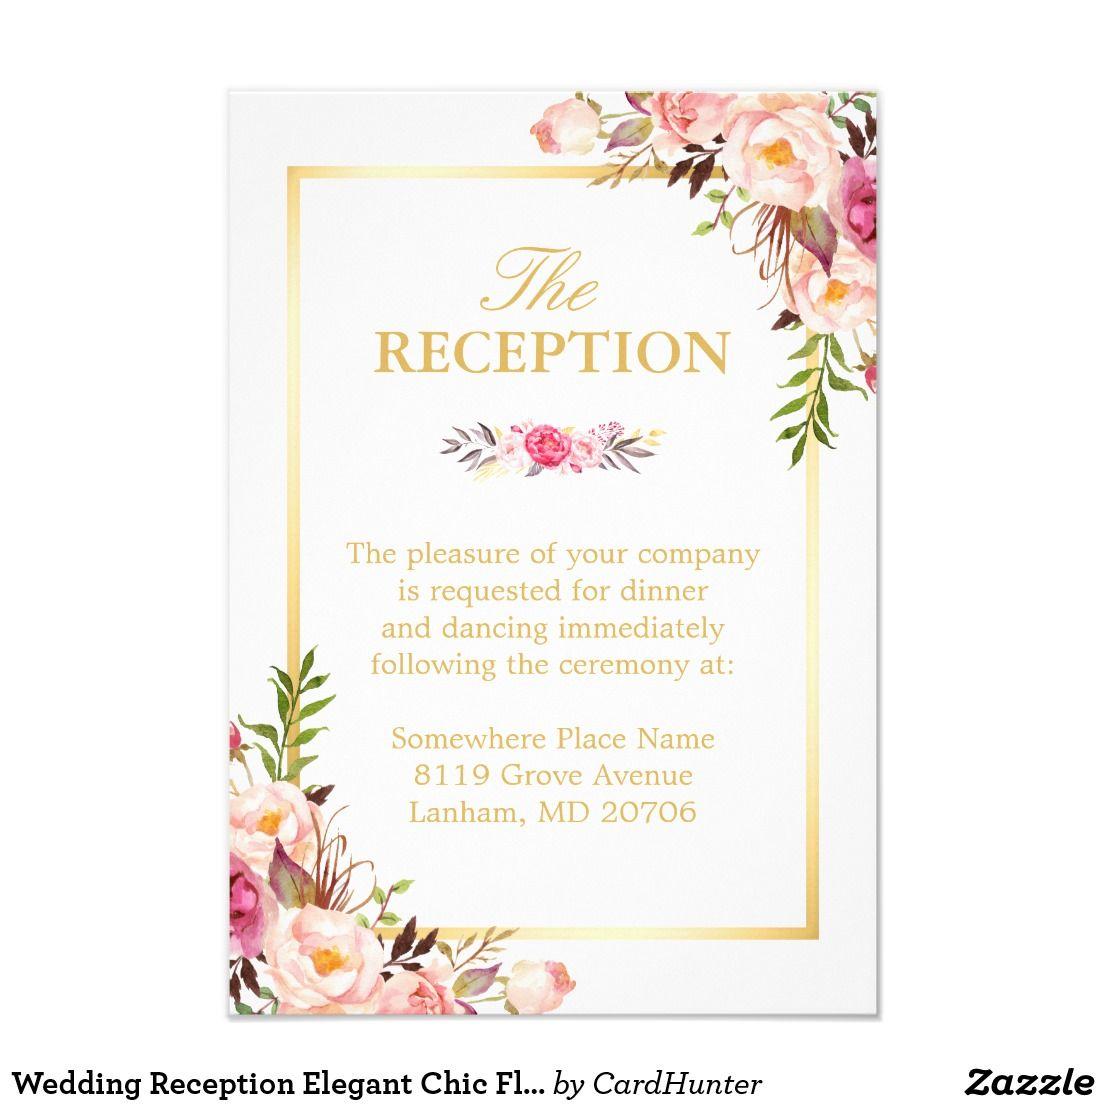 Wedding Reception Elegant Chic Floral Gold Frame Card | Elegant chic ...